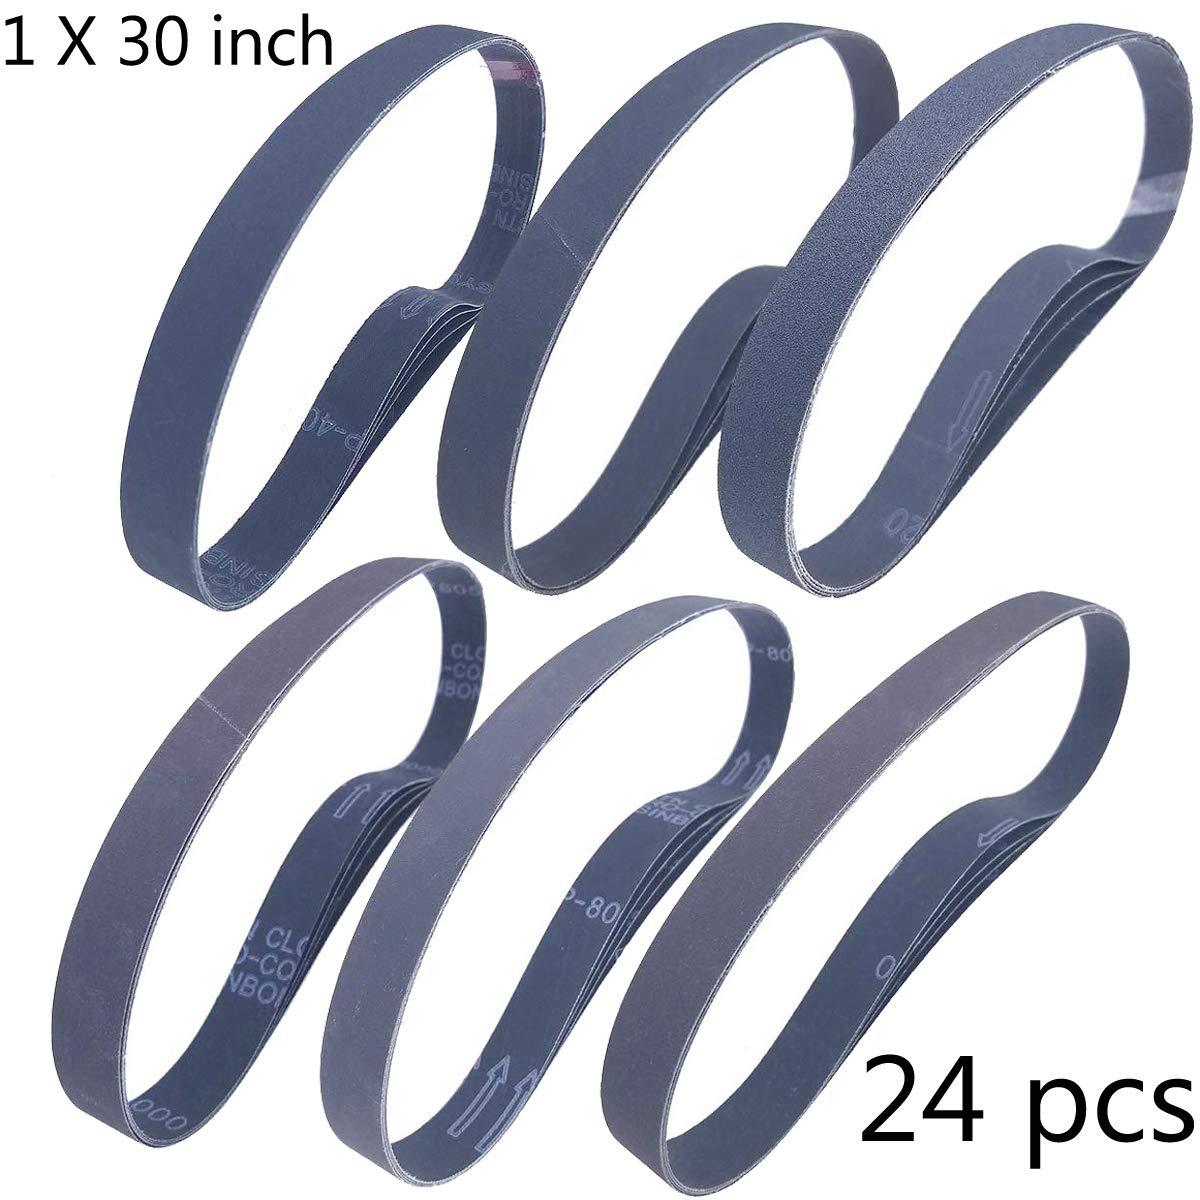 Sackorange 1 x 30 Inch High Performance Silicon Carbide Sanding Belts - Premium Knife Sharpening Sanding Belts Assortment 120 240 400 600 800 and 1000 Grits - 24 Pack